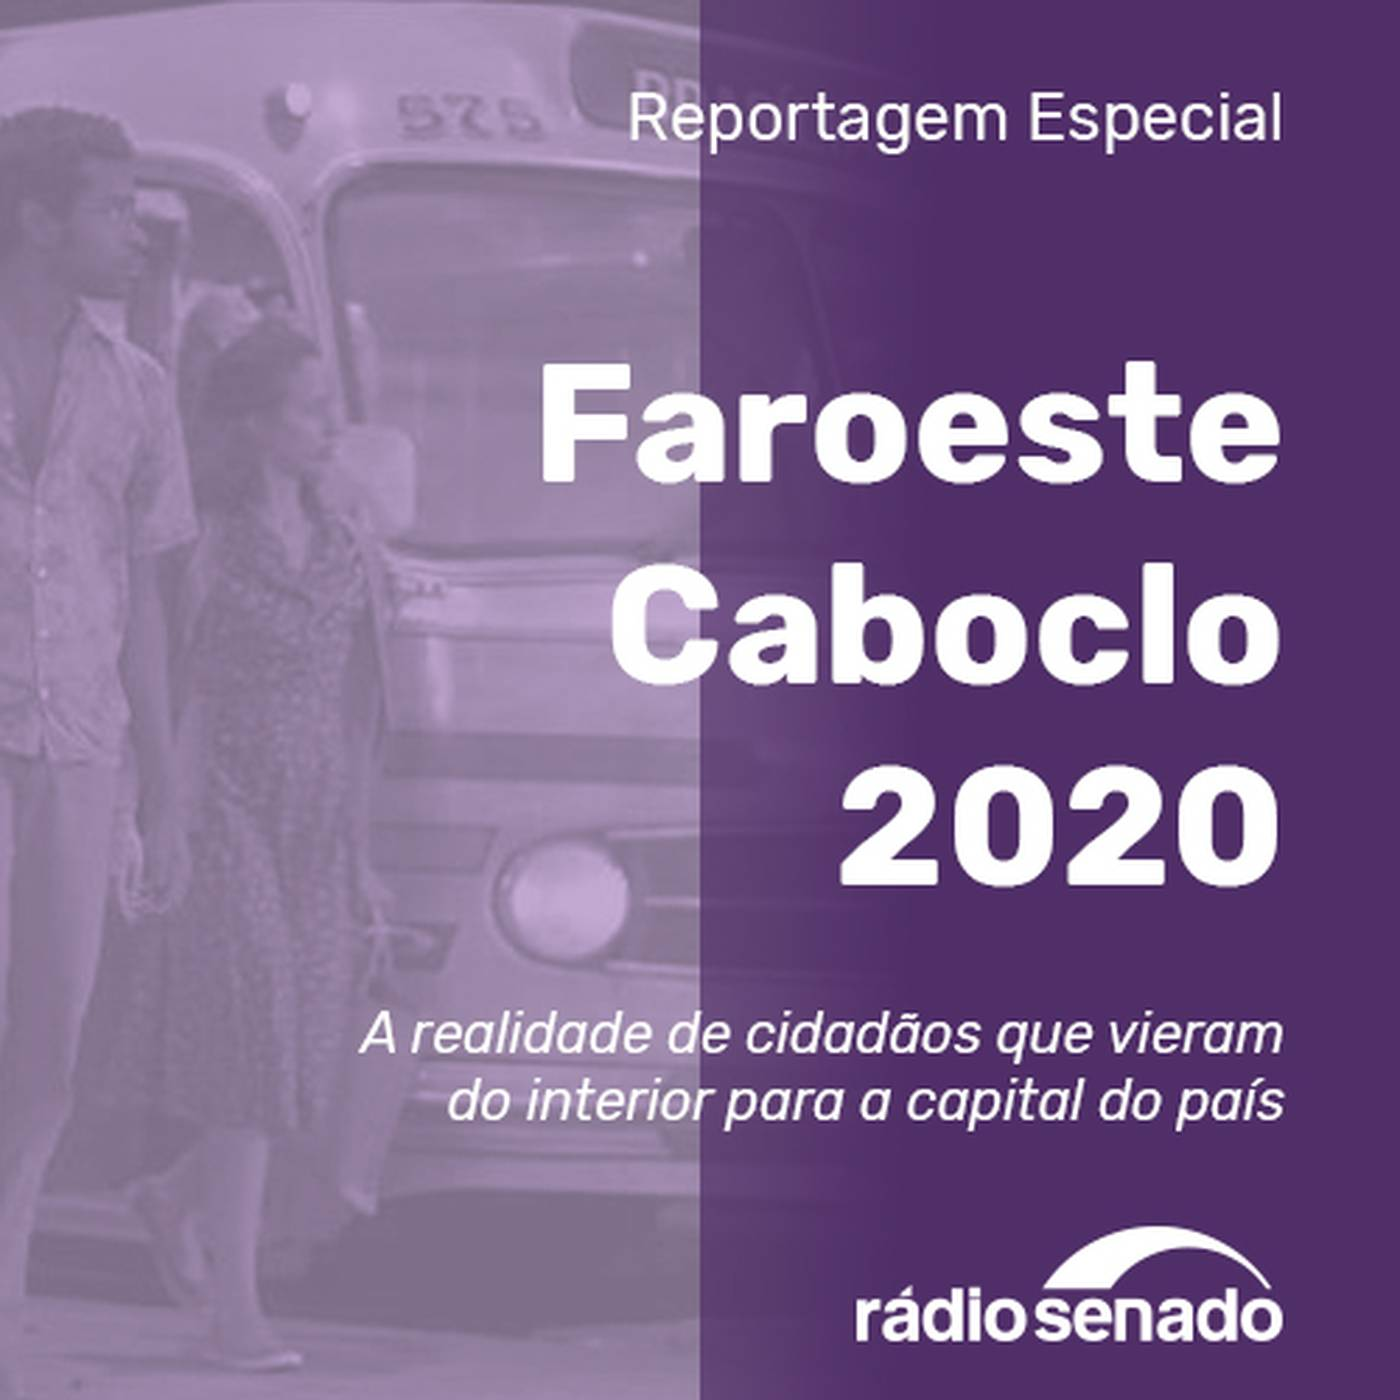 Faroeste Caboclo 2020